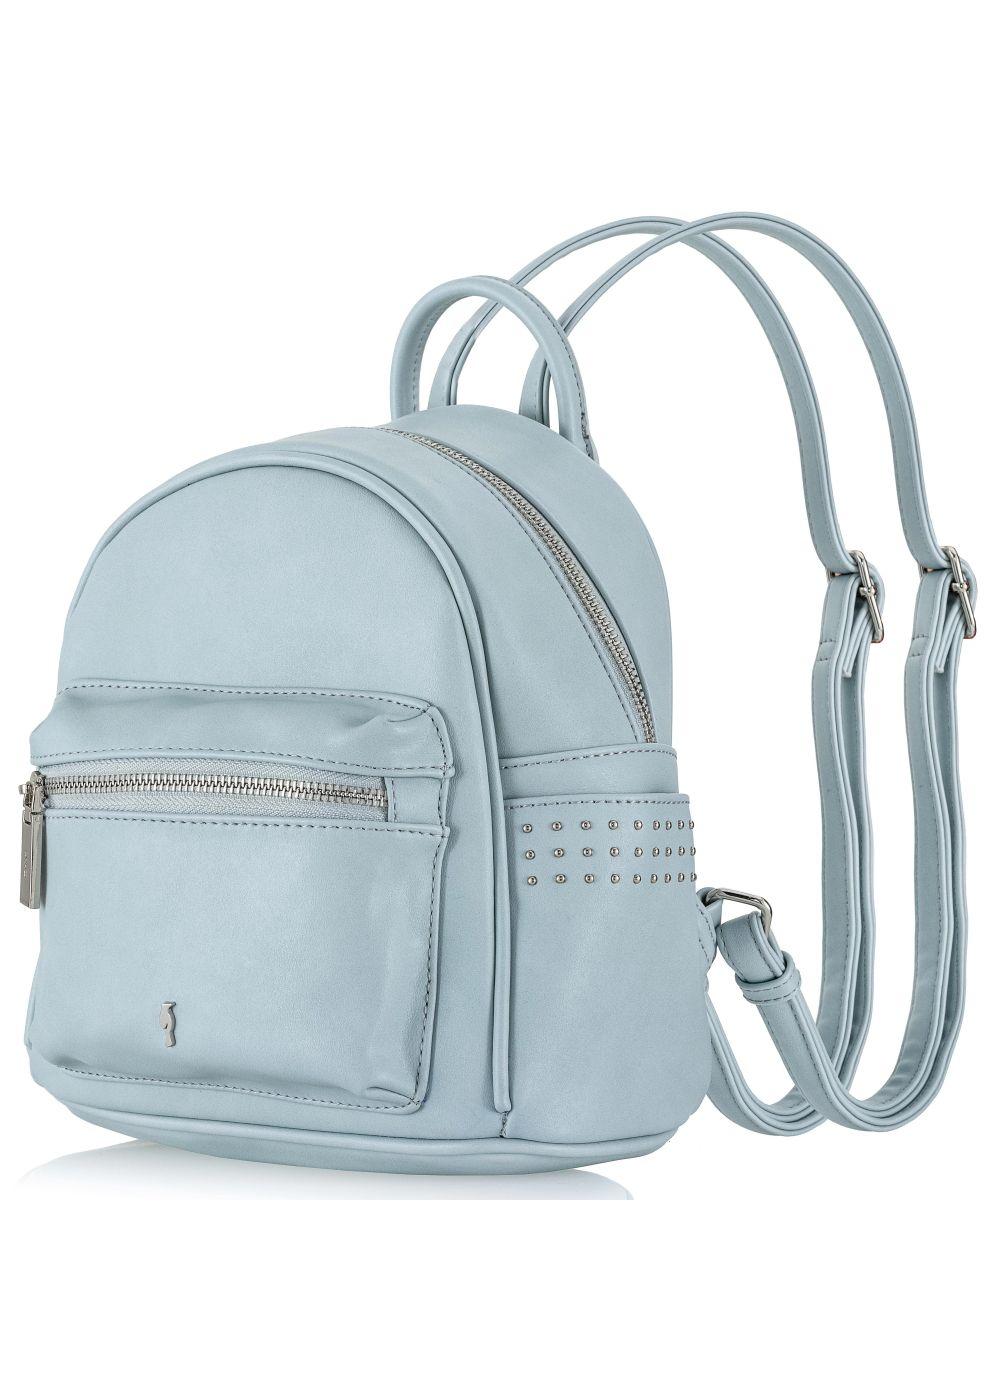 Plecak damski TOREC-0426-61(W21)